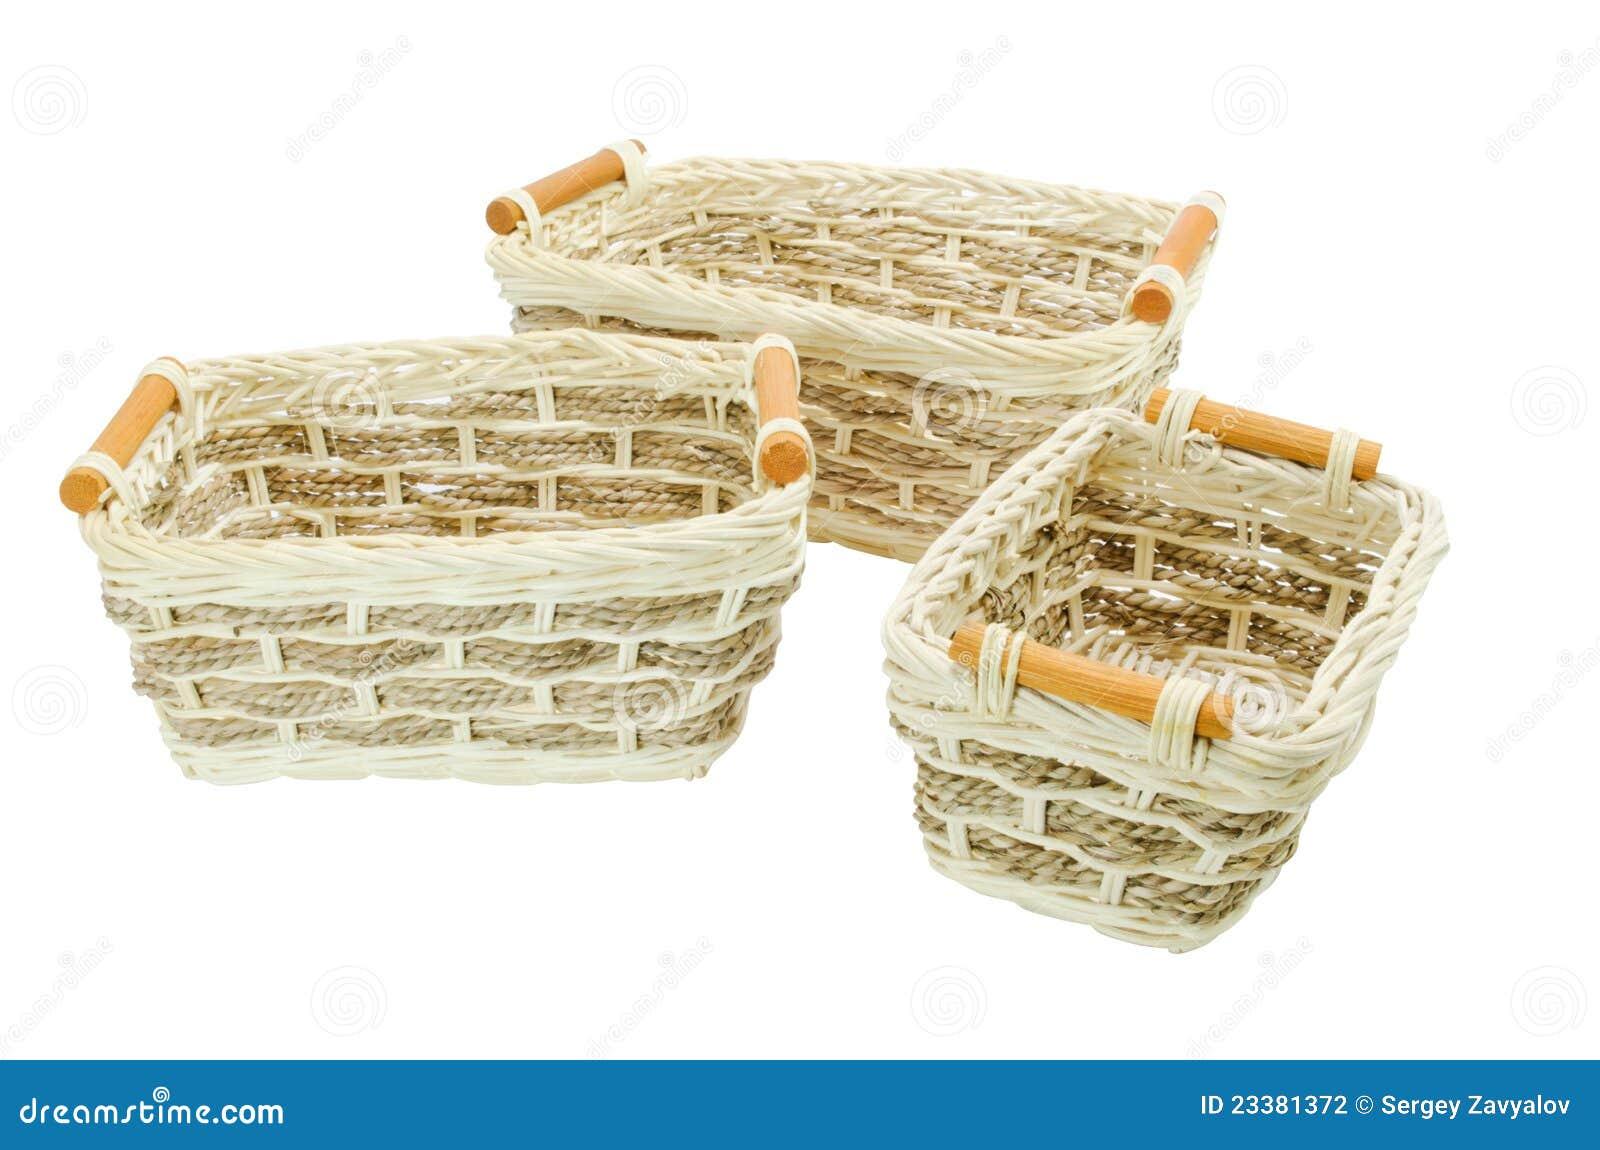 Peque as cestas de mimbre fotograf a de archivo imagen - Cestas de mimbre pequenas ...